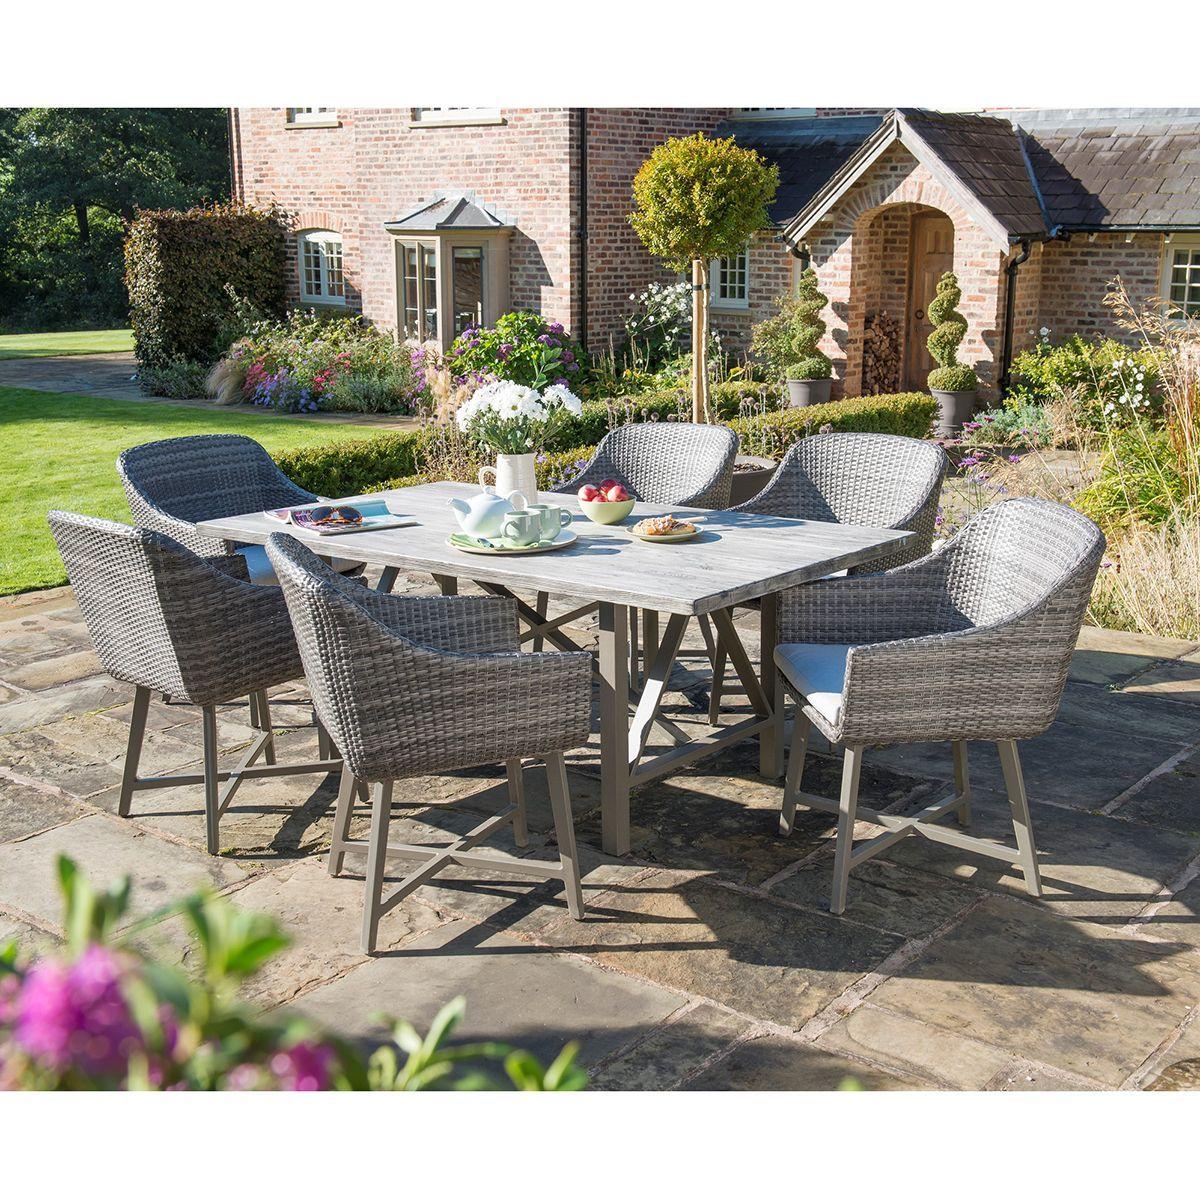 Kettler La Mode 12 Seat Suite  Notcutts  Grey garden furniture